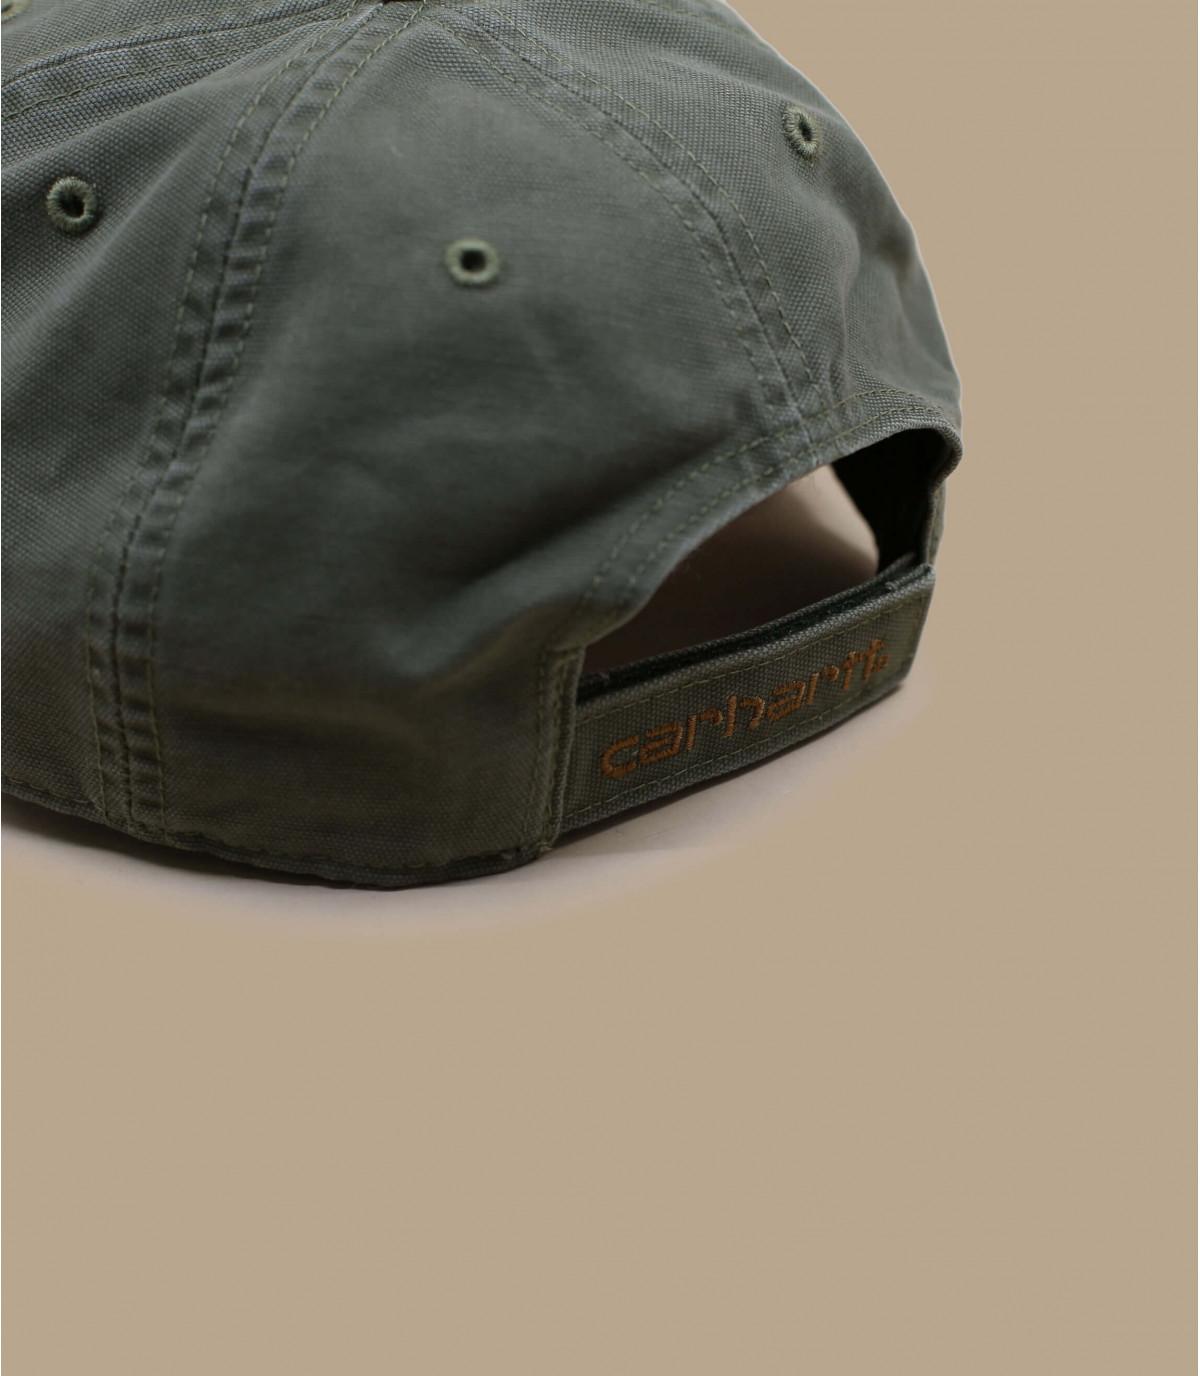 Détails Casquette Carhartt odessa army green - image 4